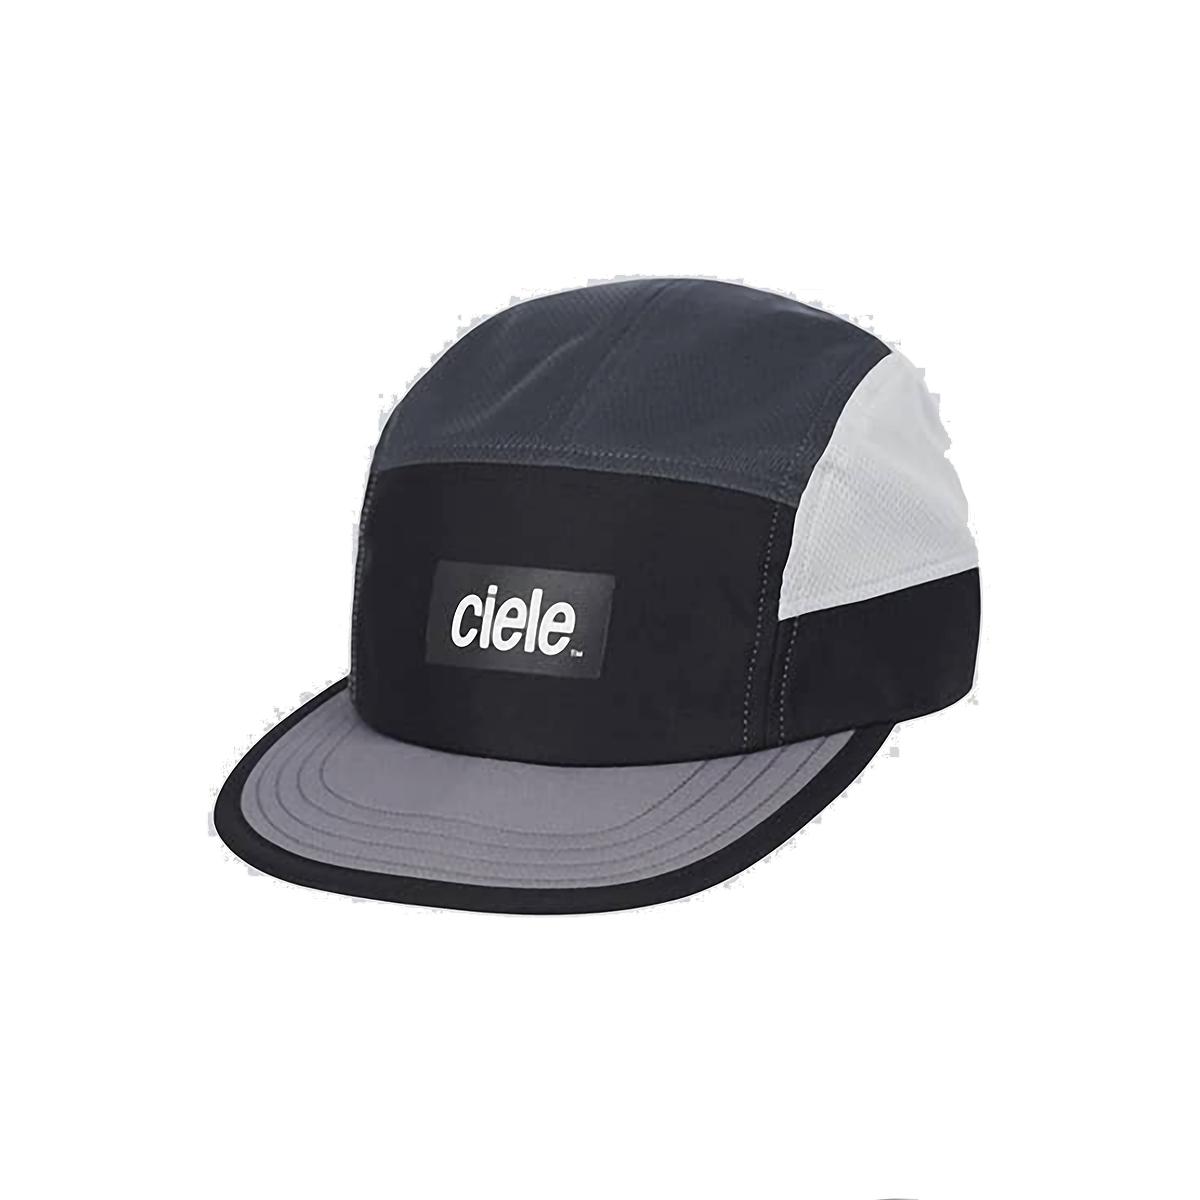 Ciele Athletics GoCap Standard Hat - Color: Whitaker, Whitaker, large, image 1